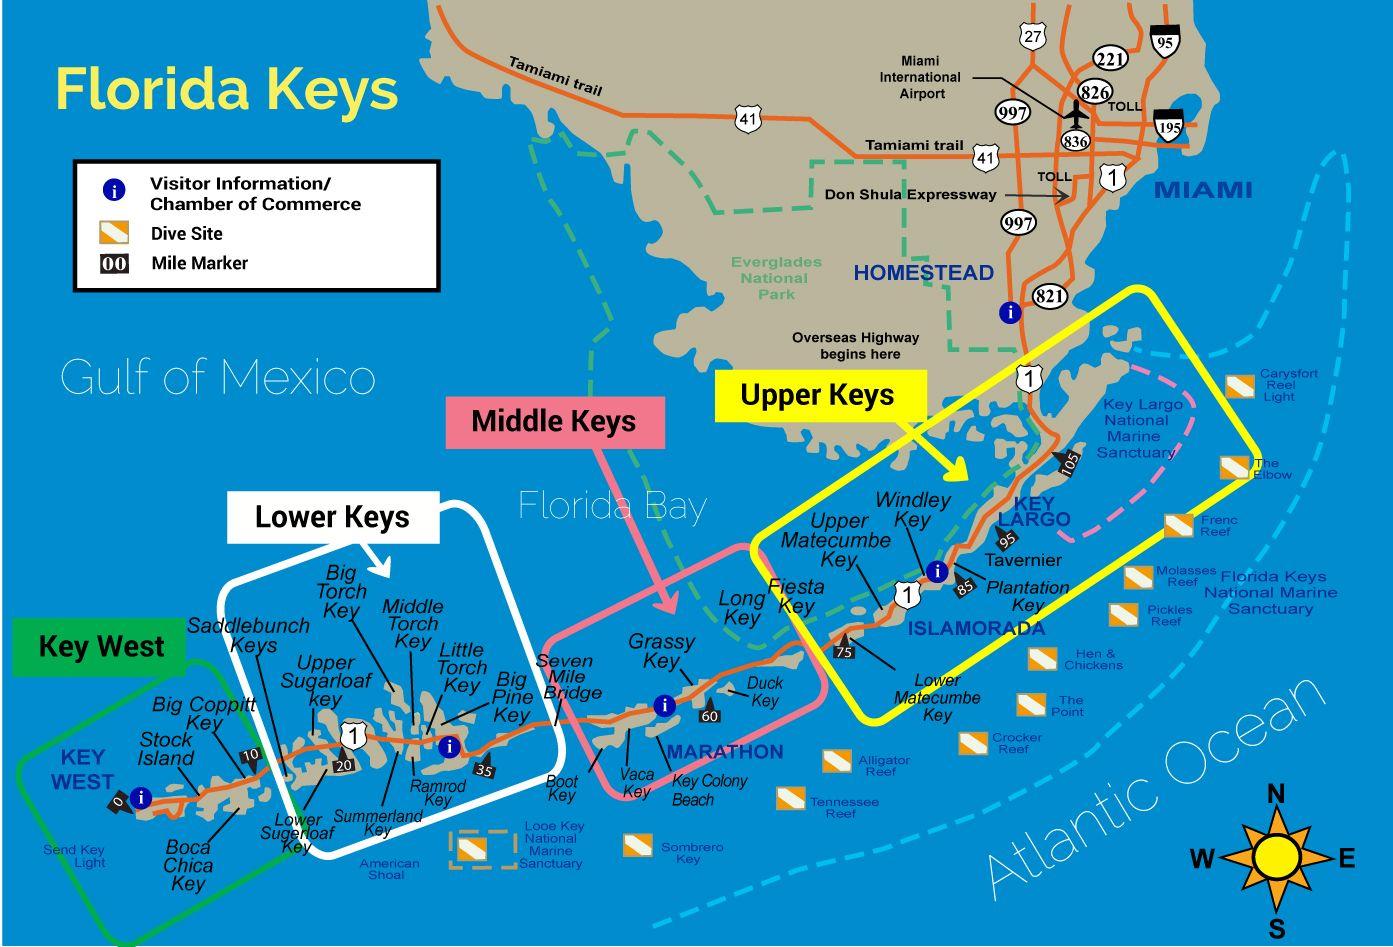 Map Of Areas Servedflorida Keys Vacation Rentals   Vacation - Florida Keys Snorkeling Map